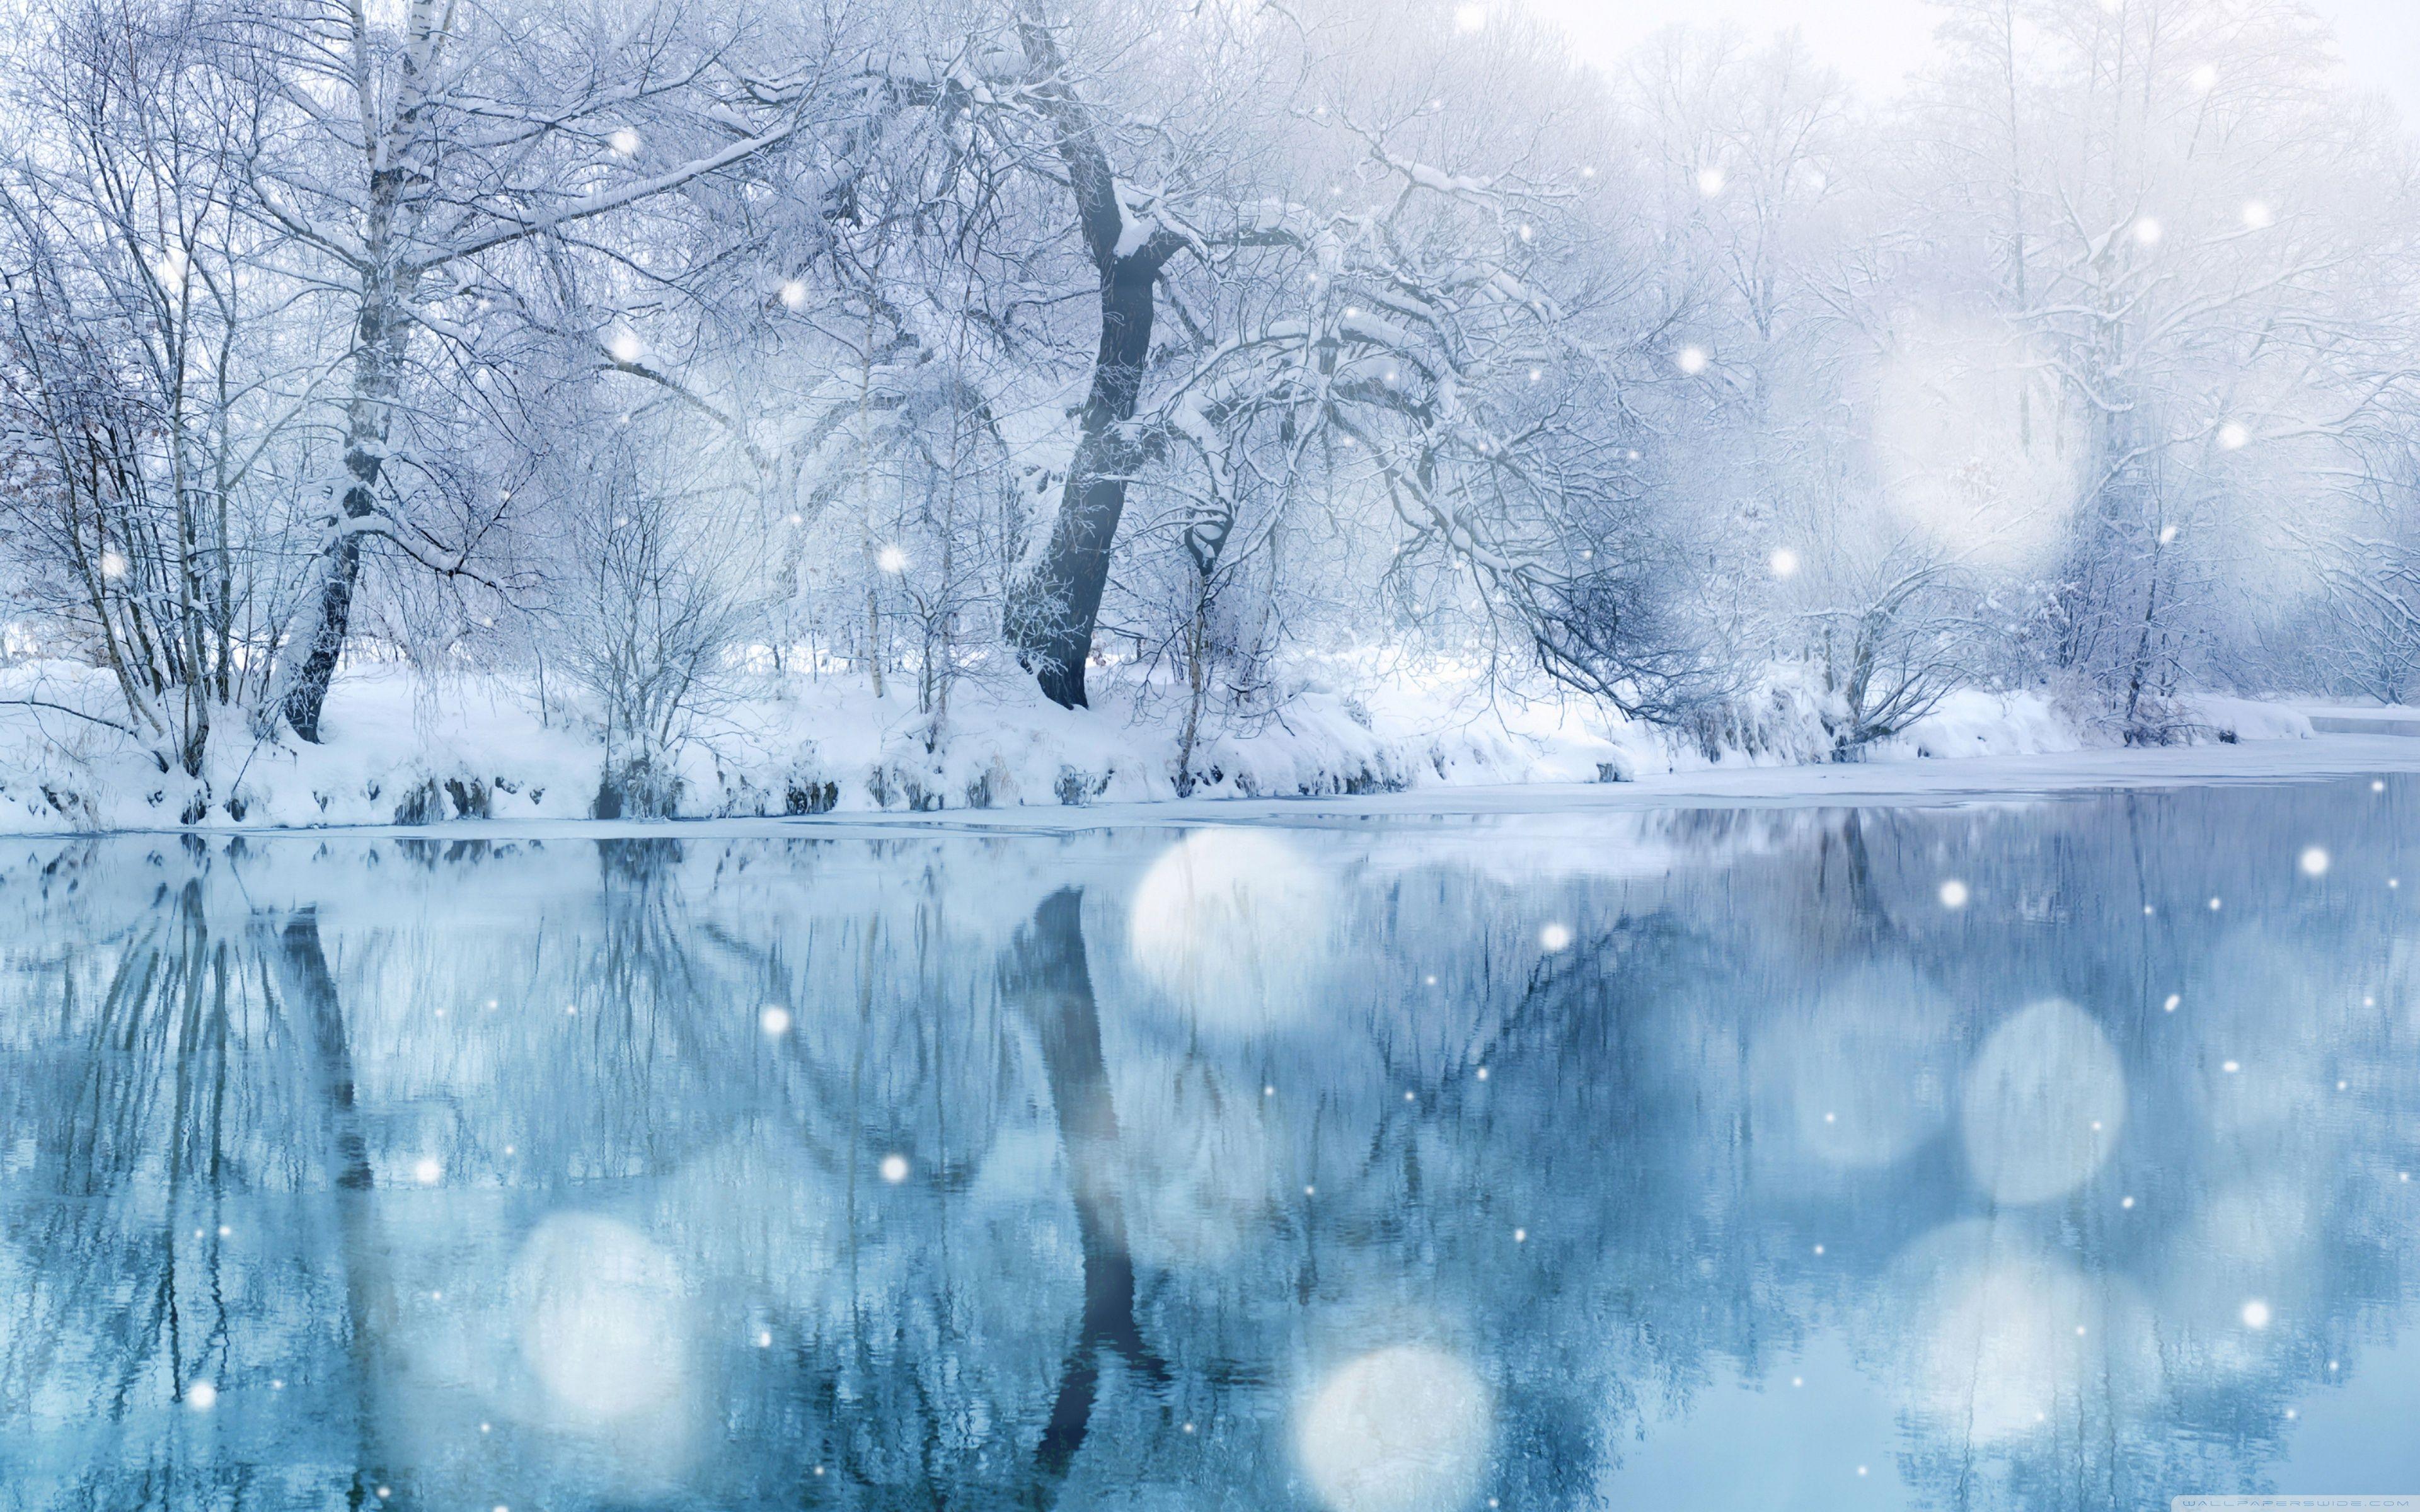 Winter Snowfall Wallpapers Wallpaper Cave